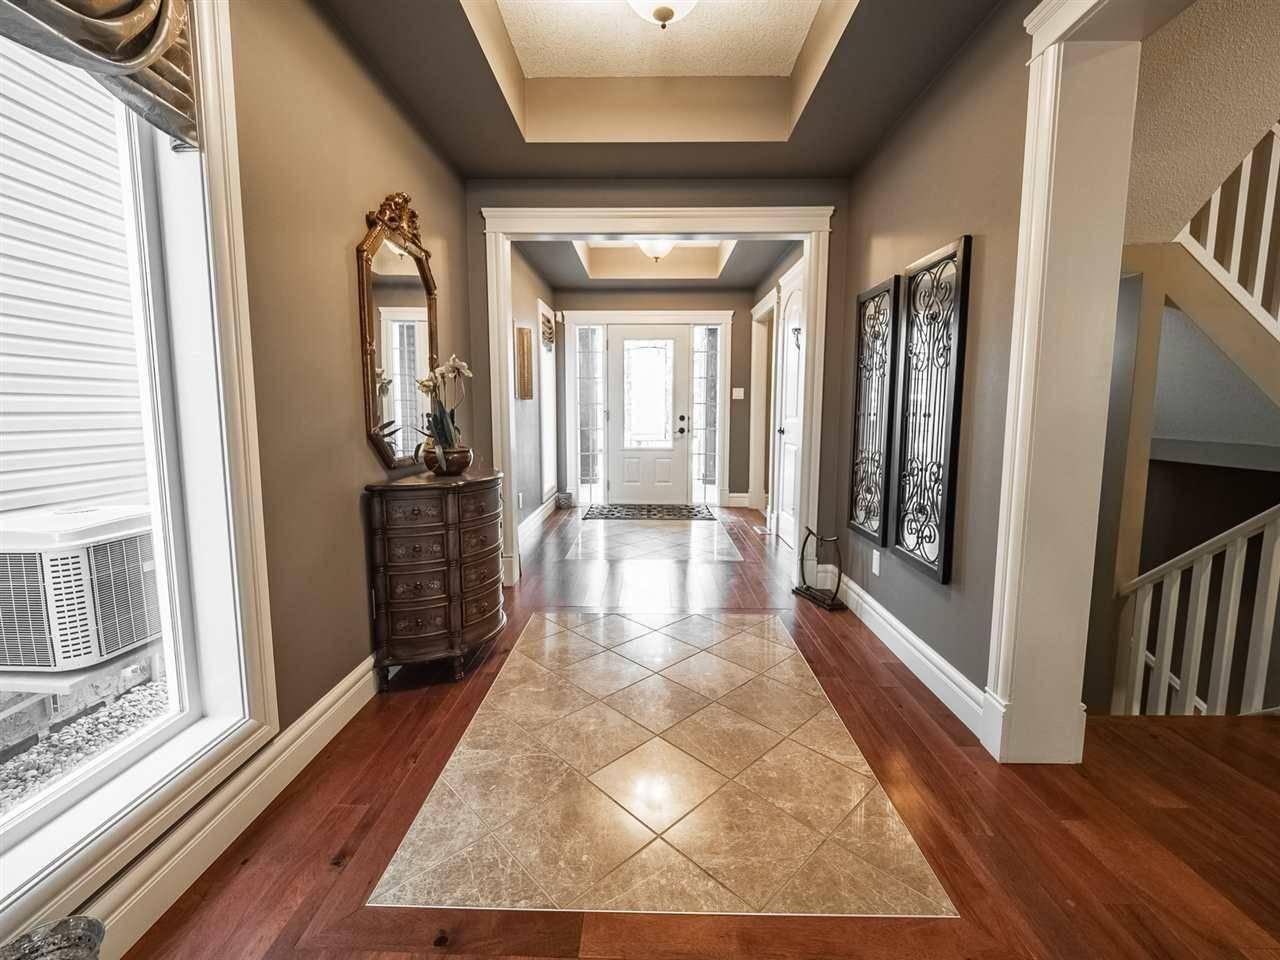 House for sale at 4020 Summerland Dr Sherwood Park Alberta - MLS: E4182655